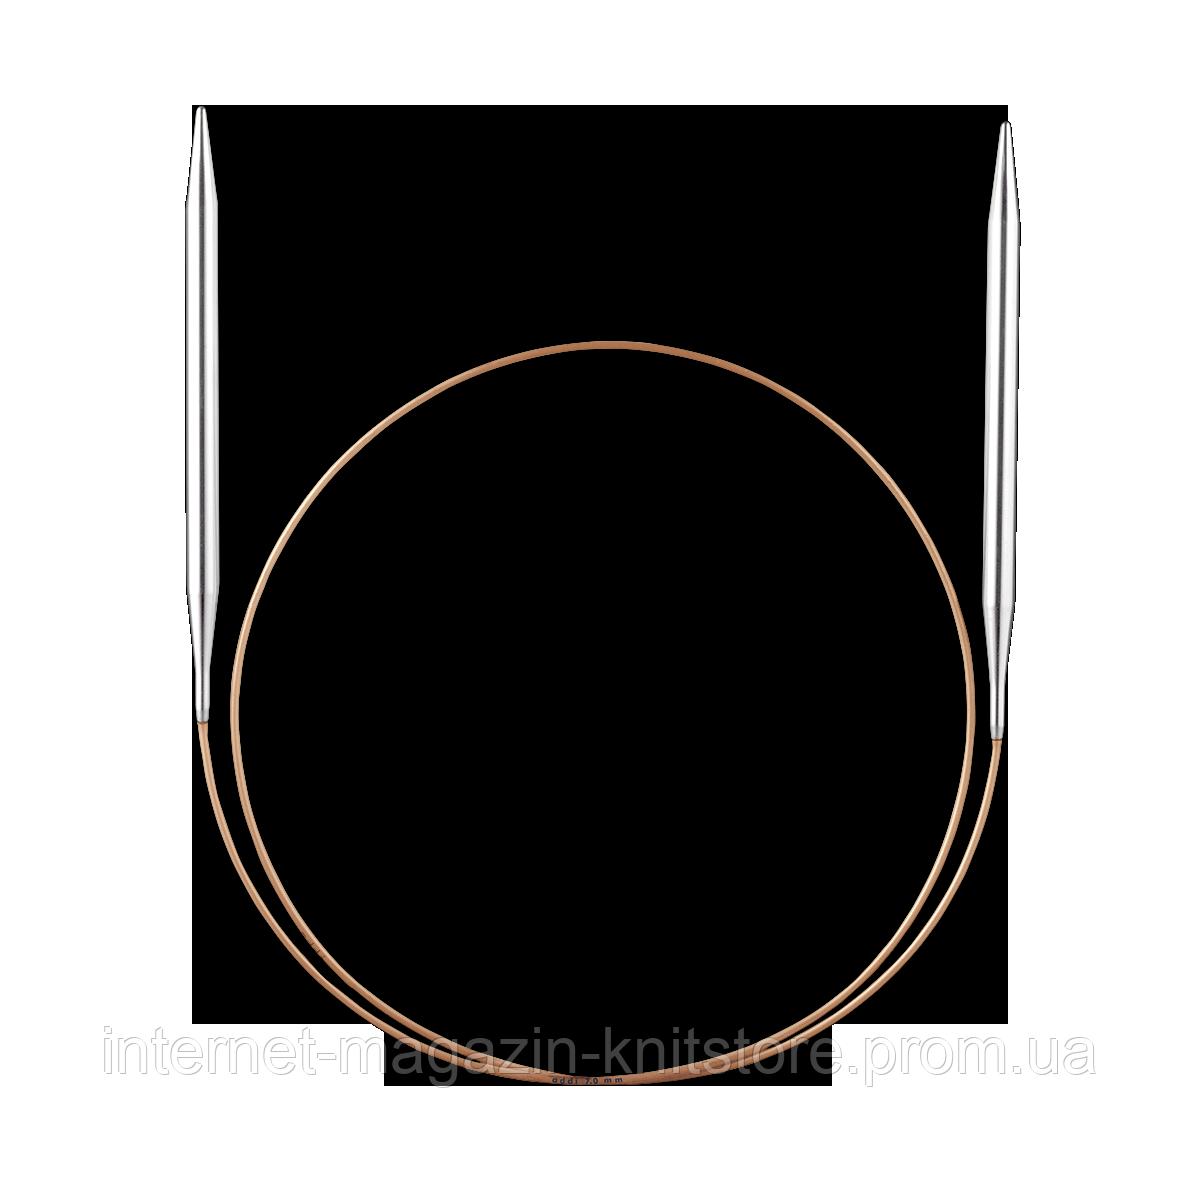 Спицы круговые Addi | 80 см | 3 мм